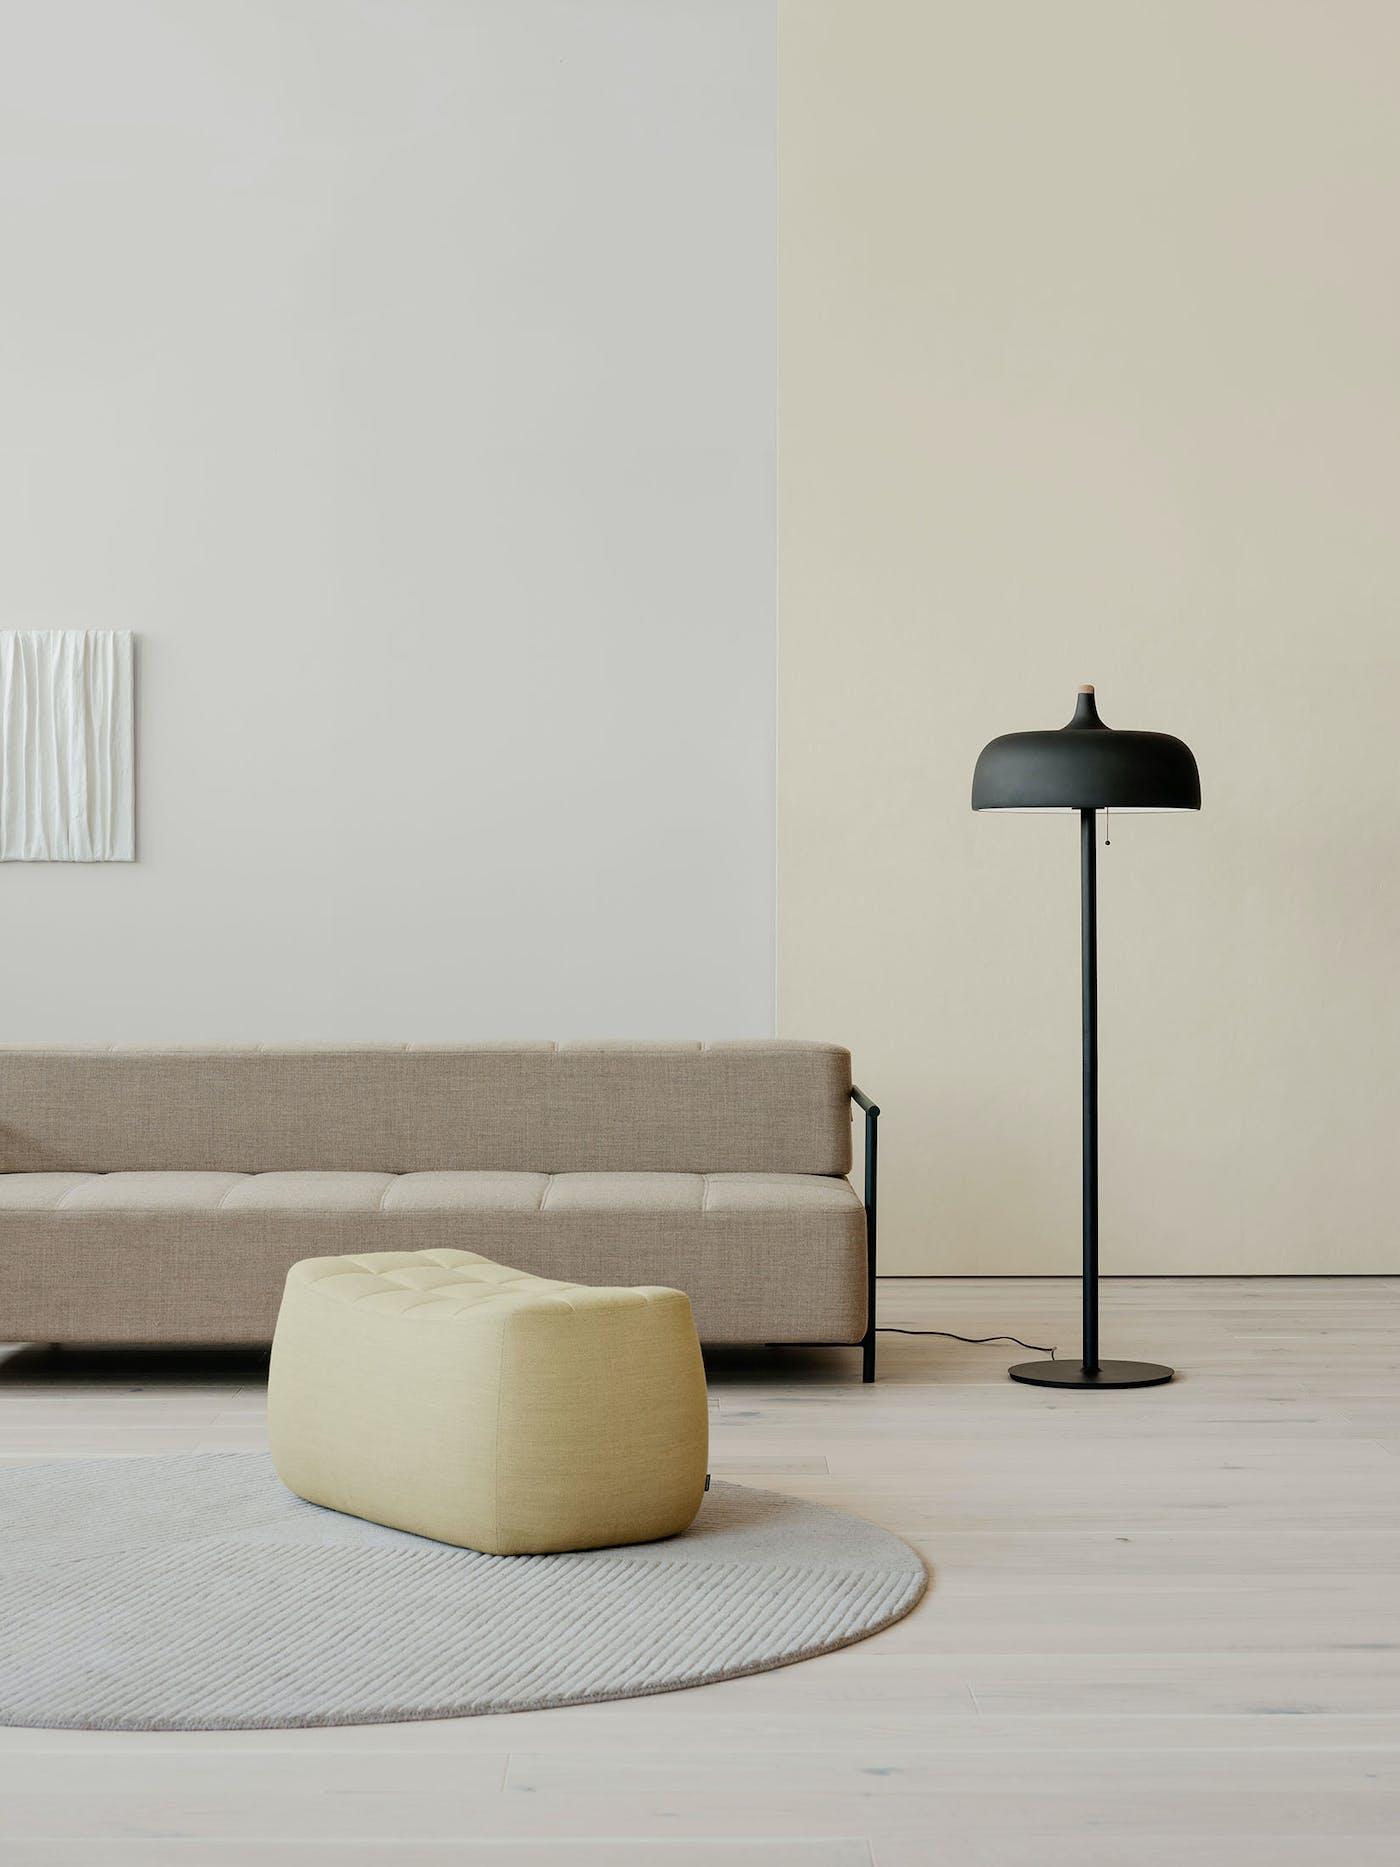 Acorn floor lamp Yam pouf livingroom Northern Photo Einar Aslaksen Low res